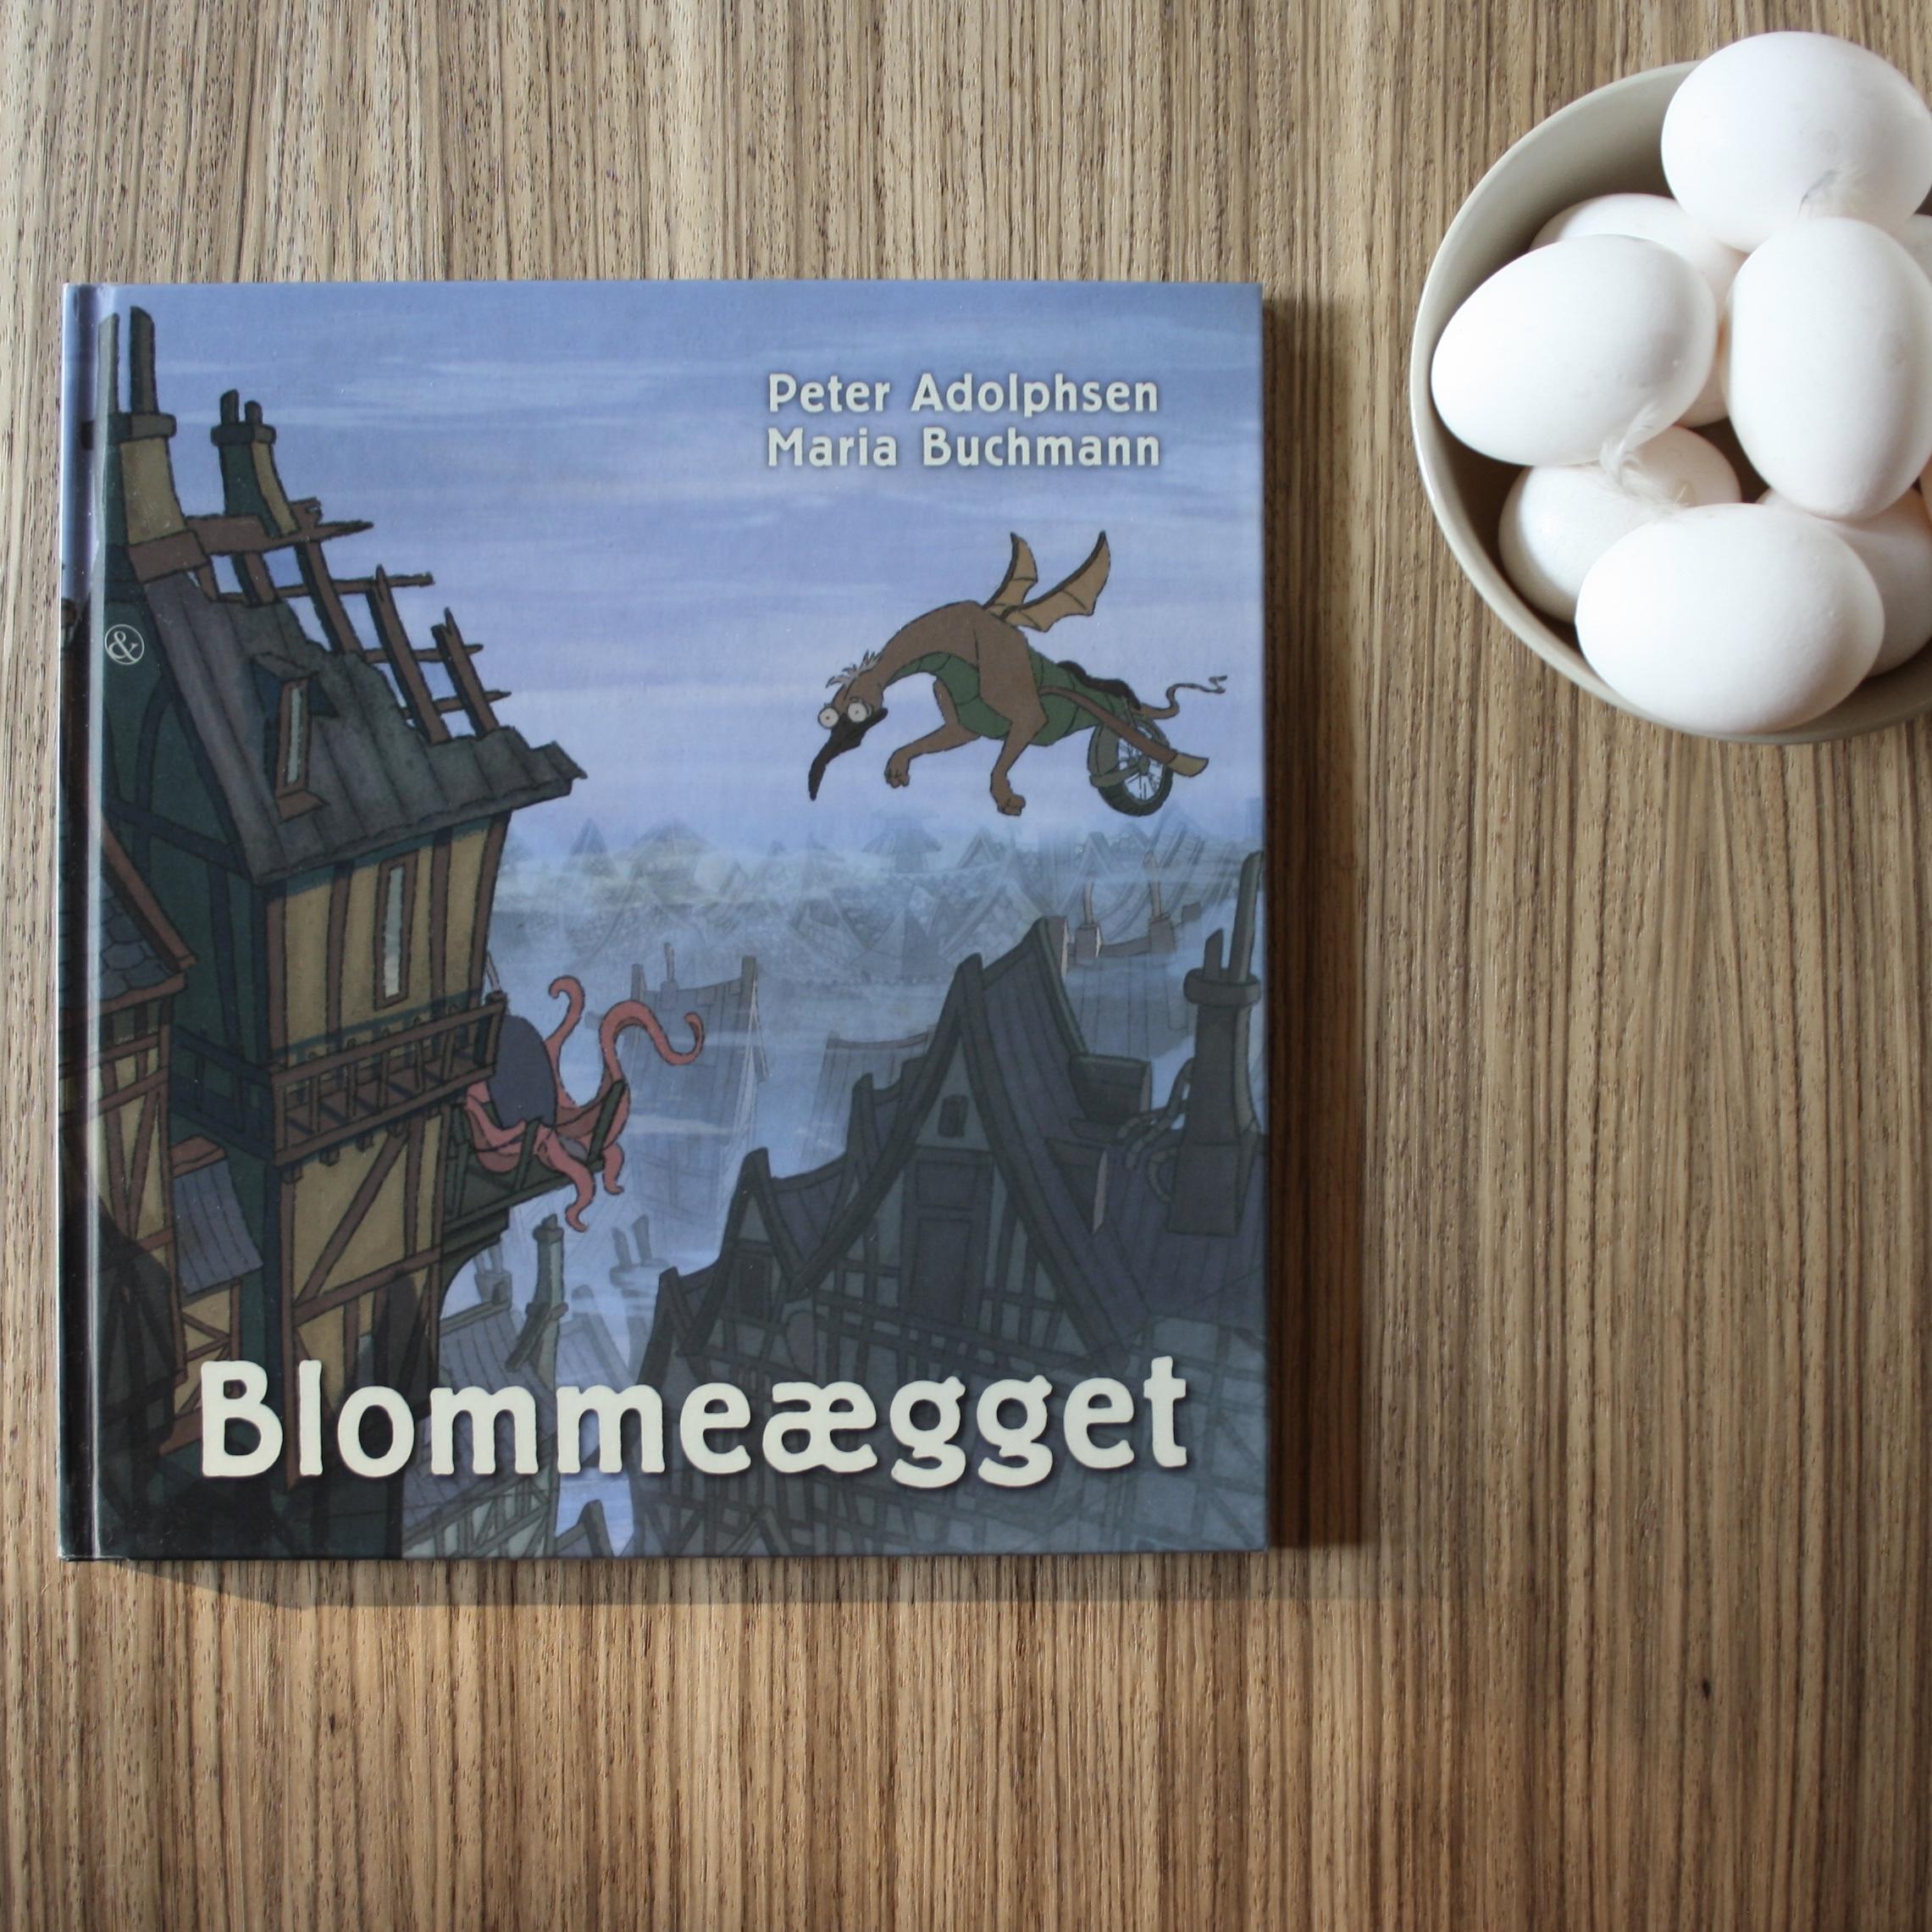 Blommeægget, Peter Adolphsen, Maria Buchmann, bogoplevelsen